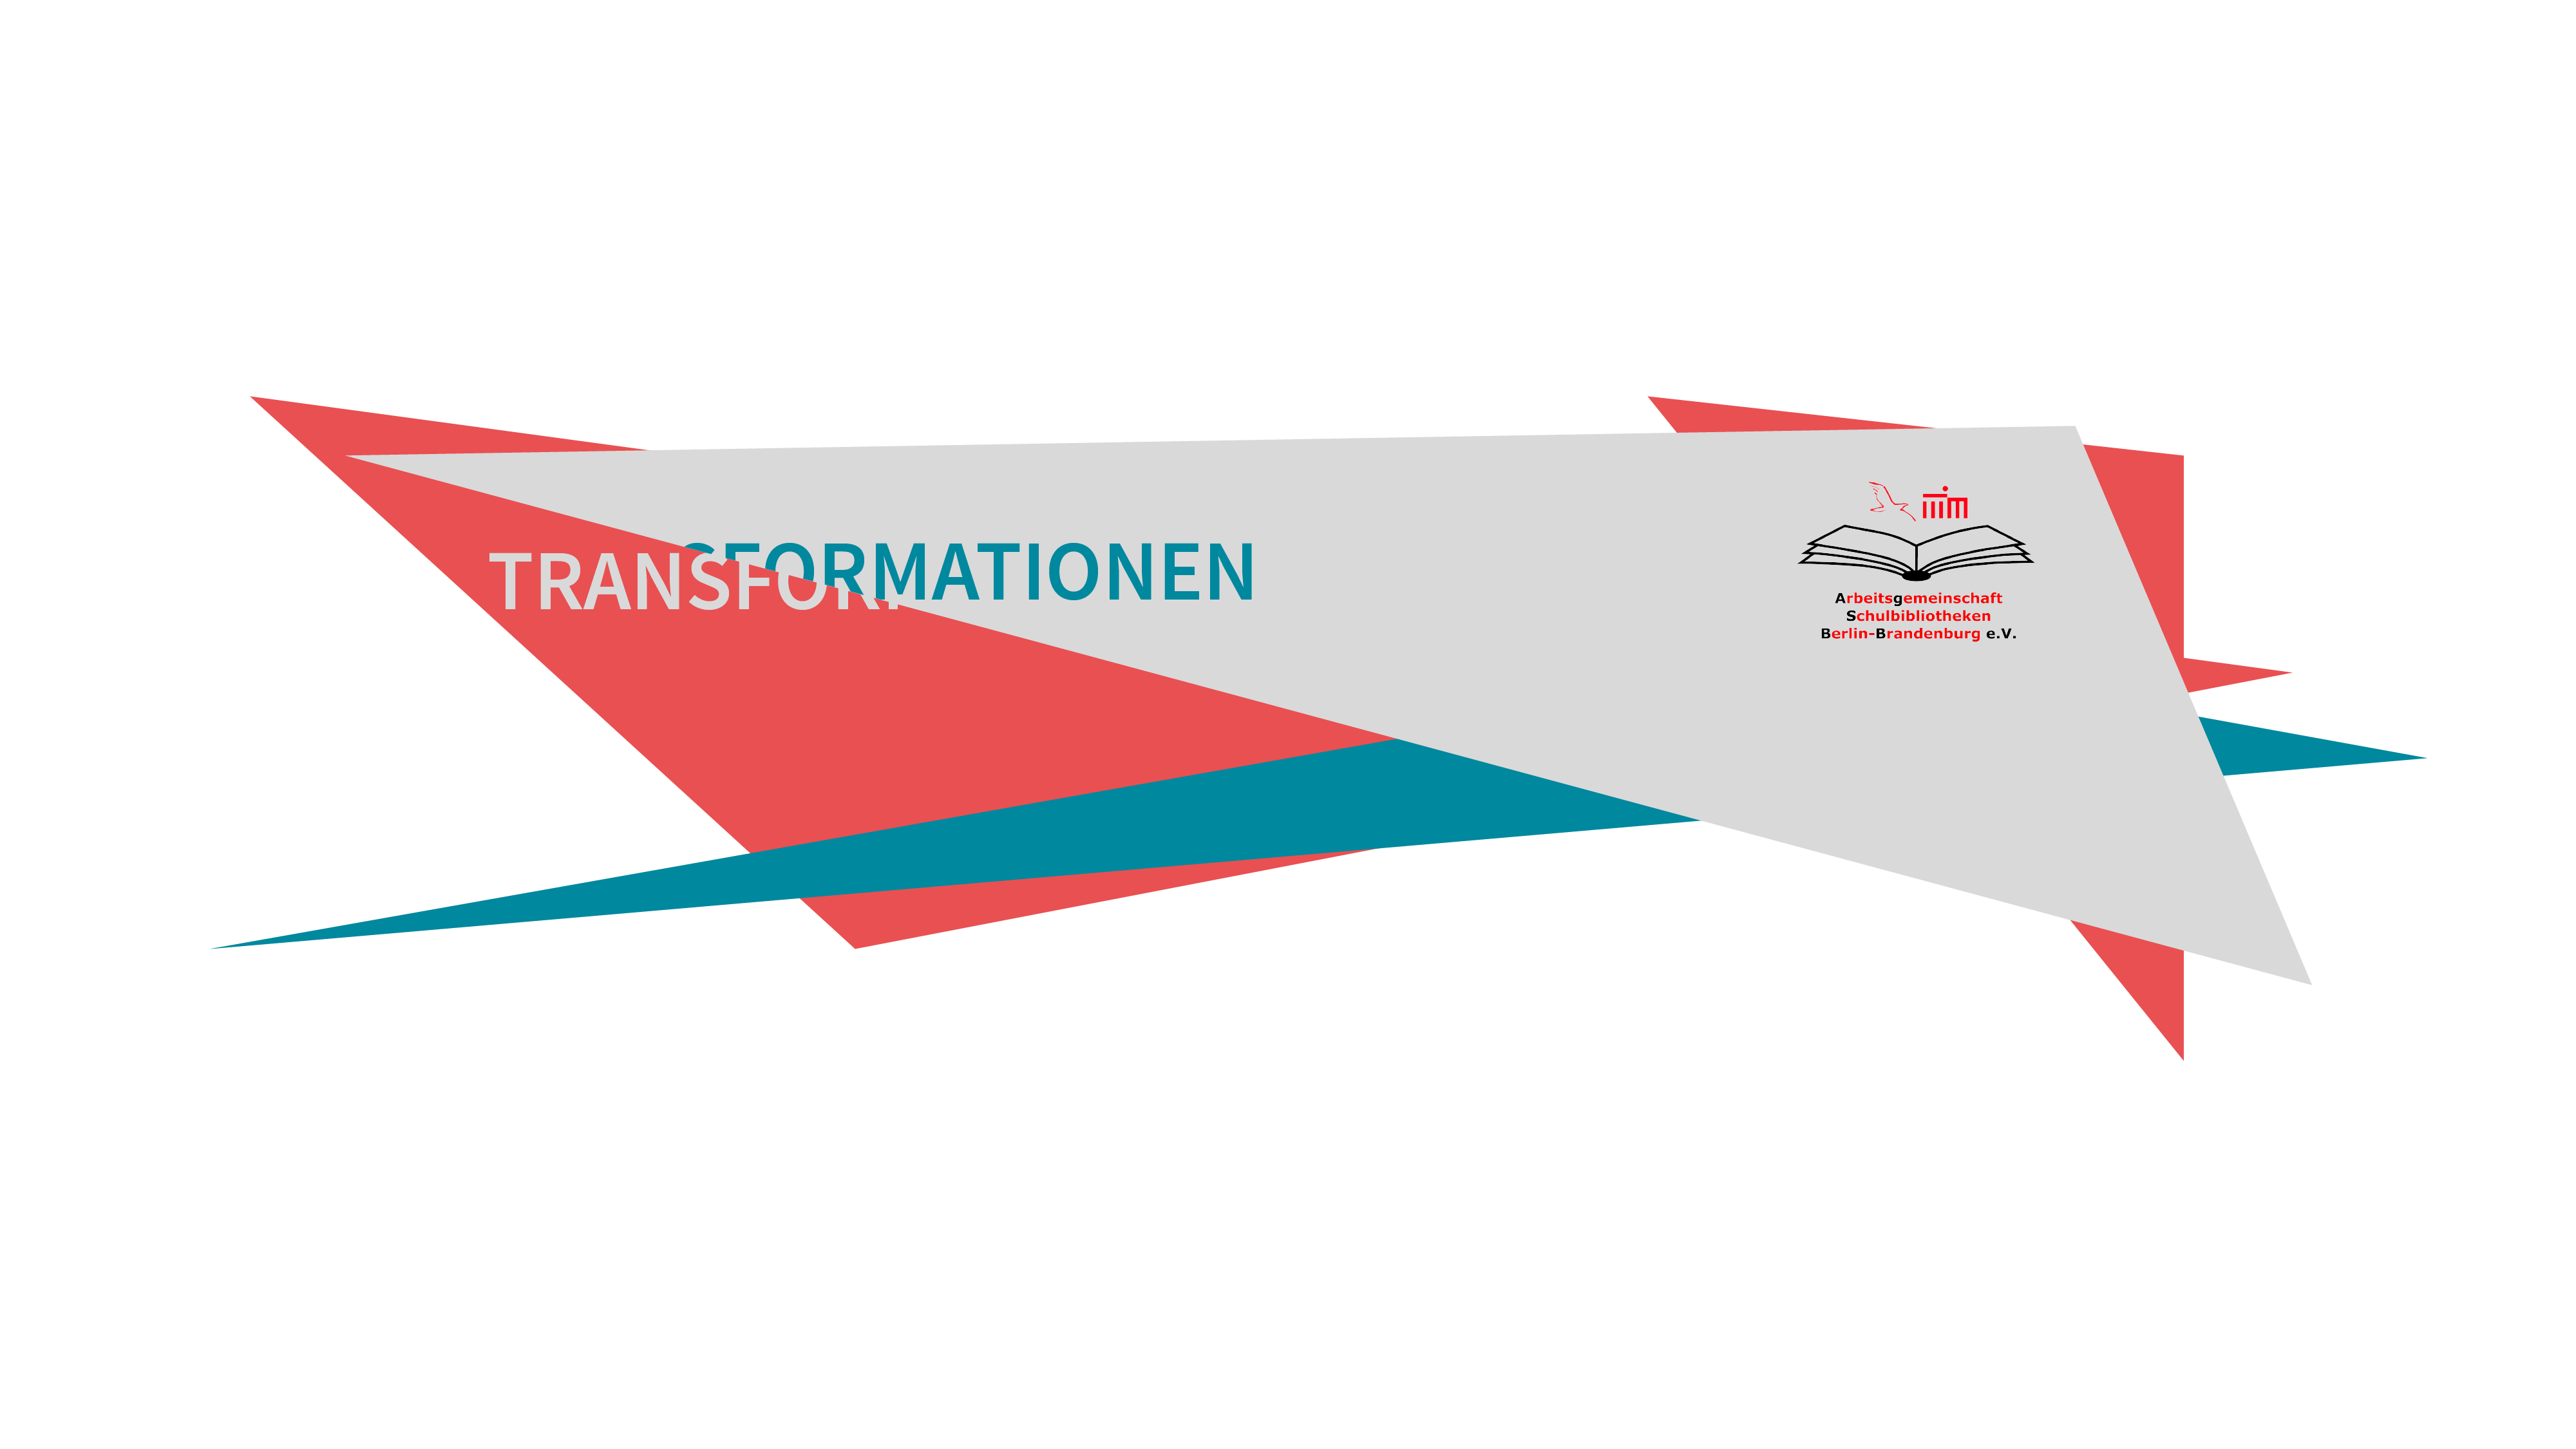 TRANSFORMATIONEN